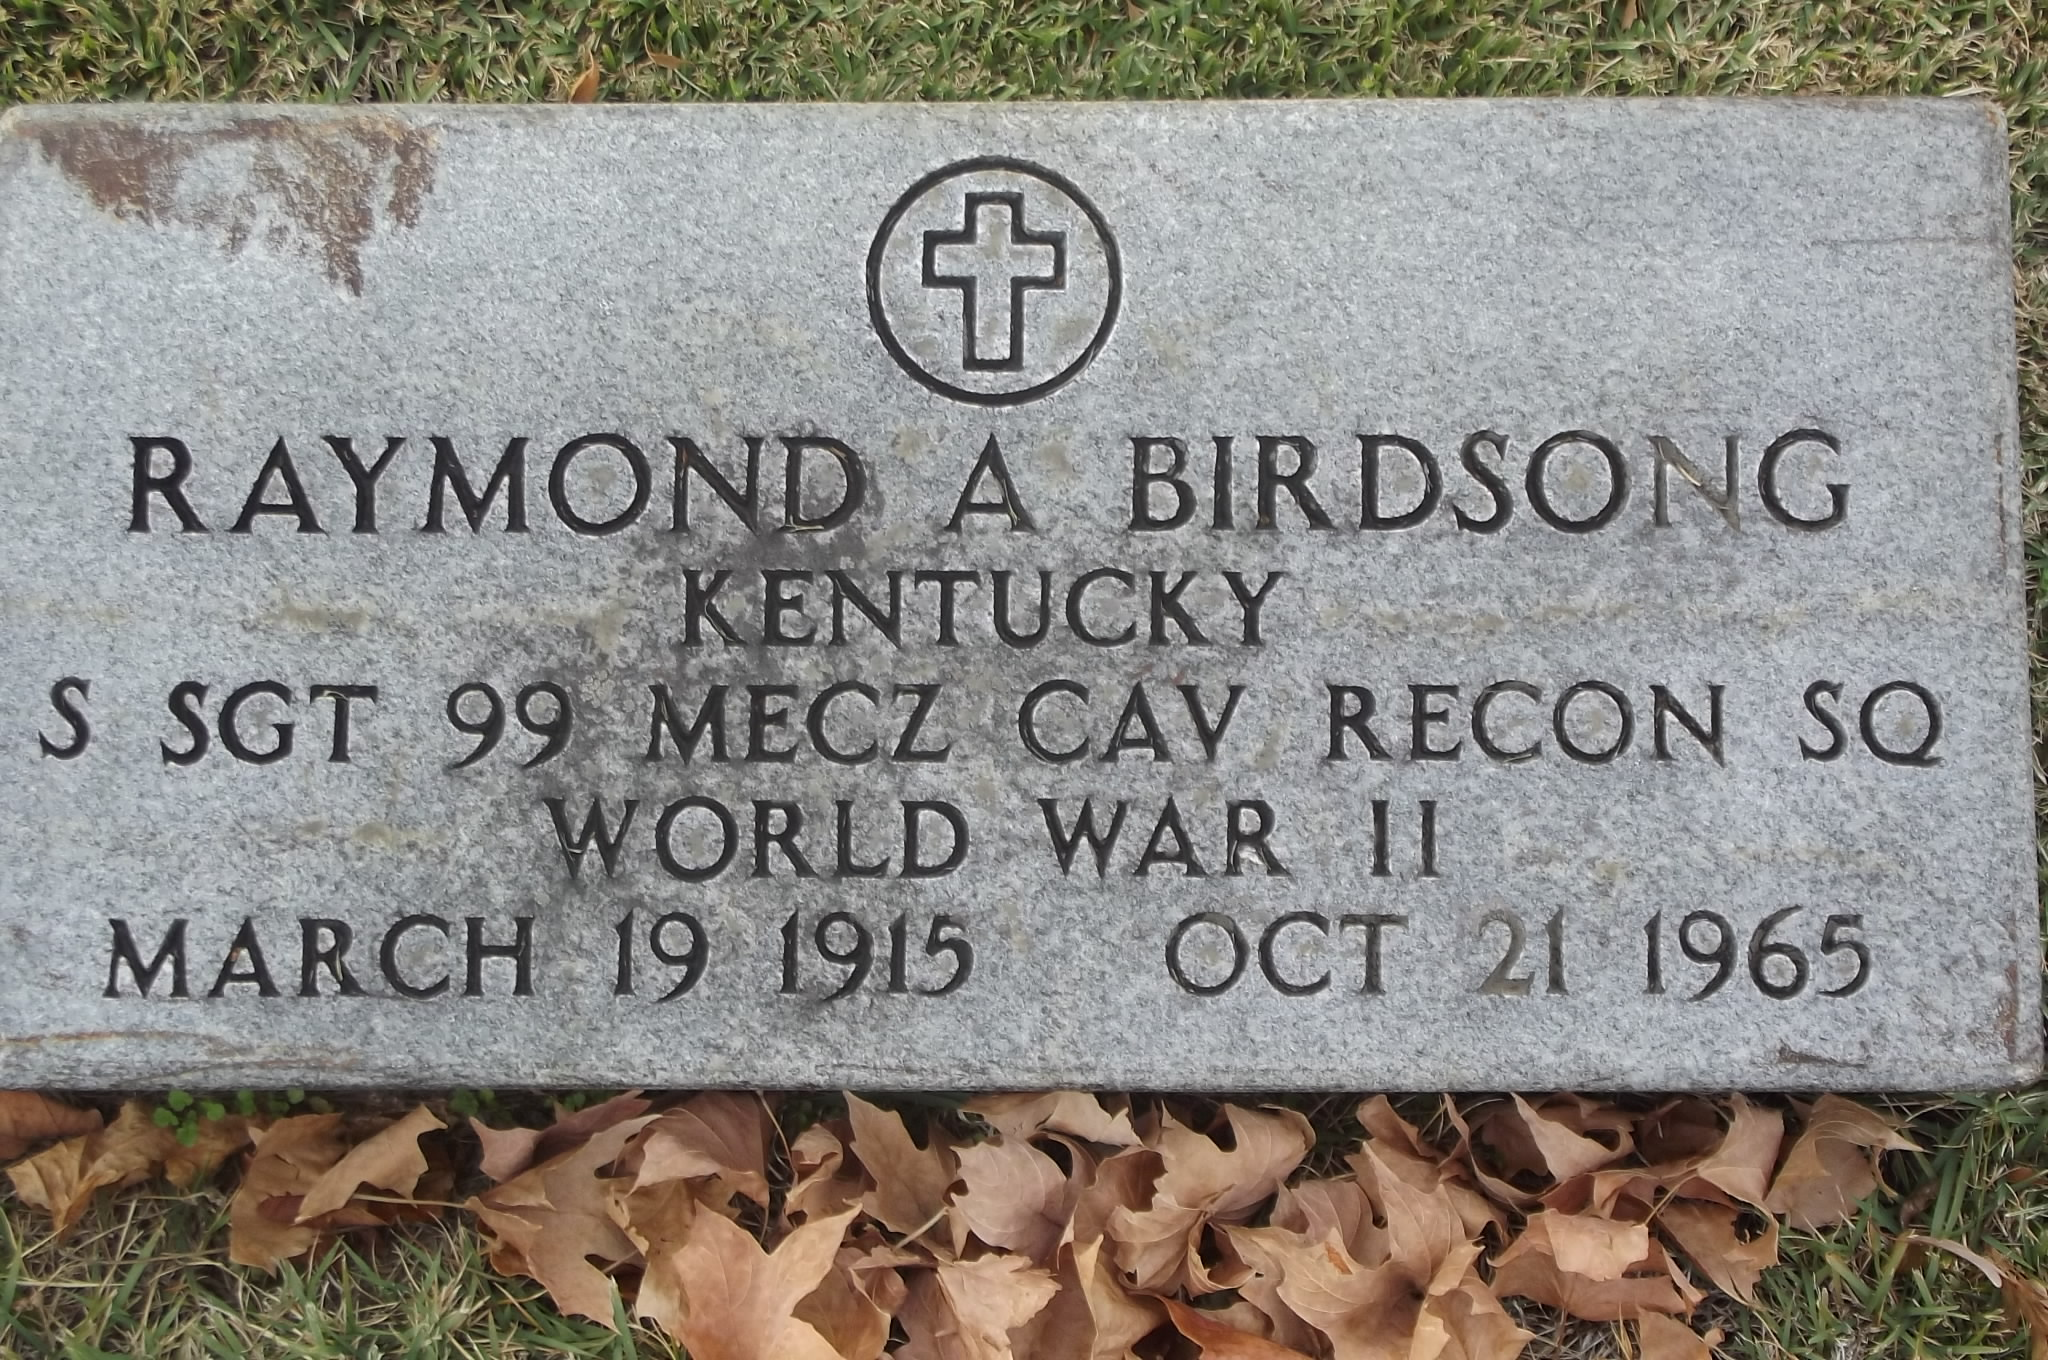 Conservation Officer Raymond Alexander Birdsong | Kentucky Department of Fish and Wildlife Resources, Kentucky